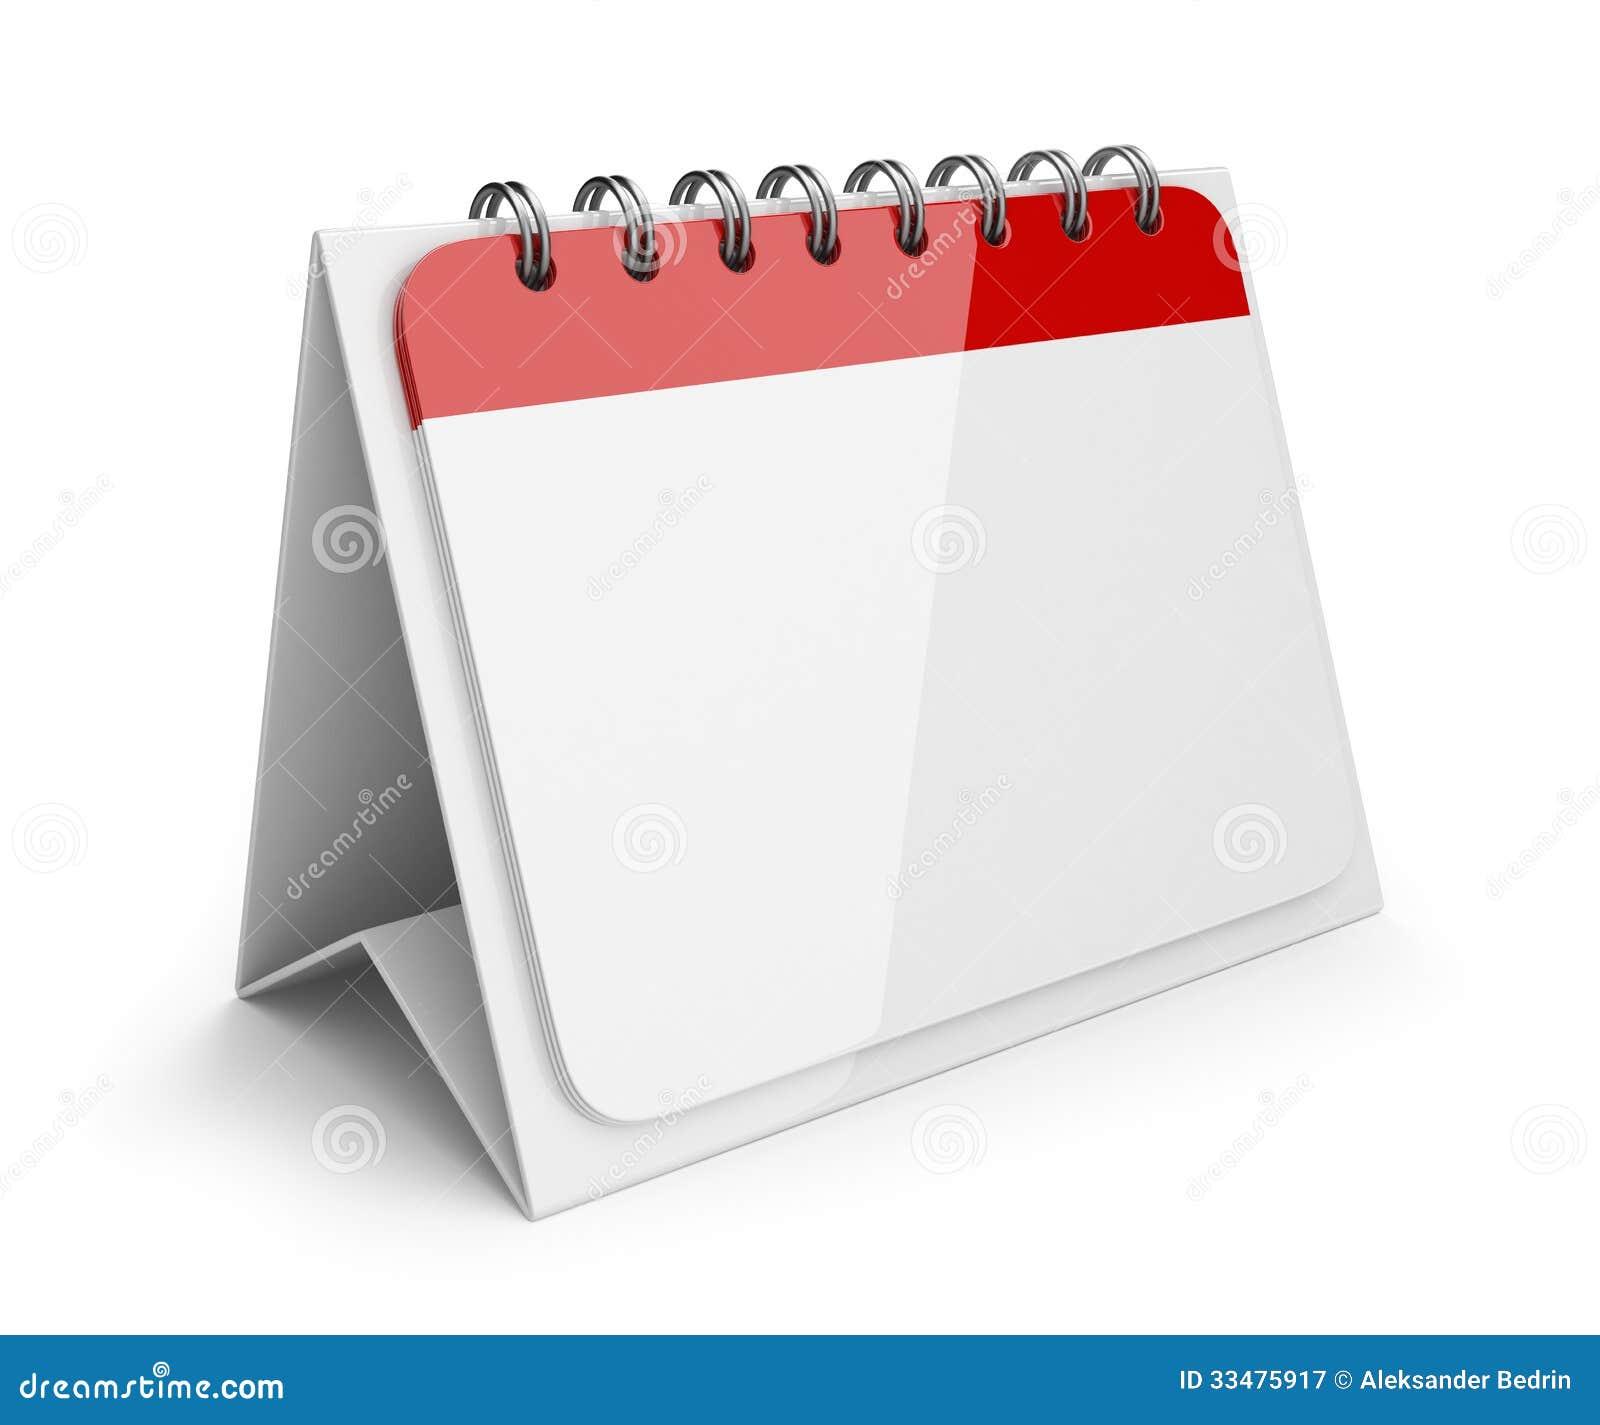 Blank Calendar Icon : Blank paper calendar d icon stock illustration